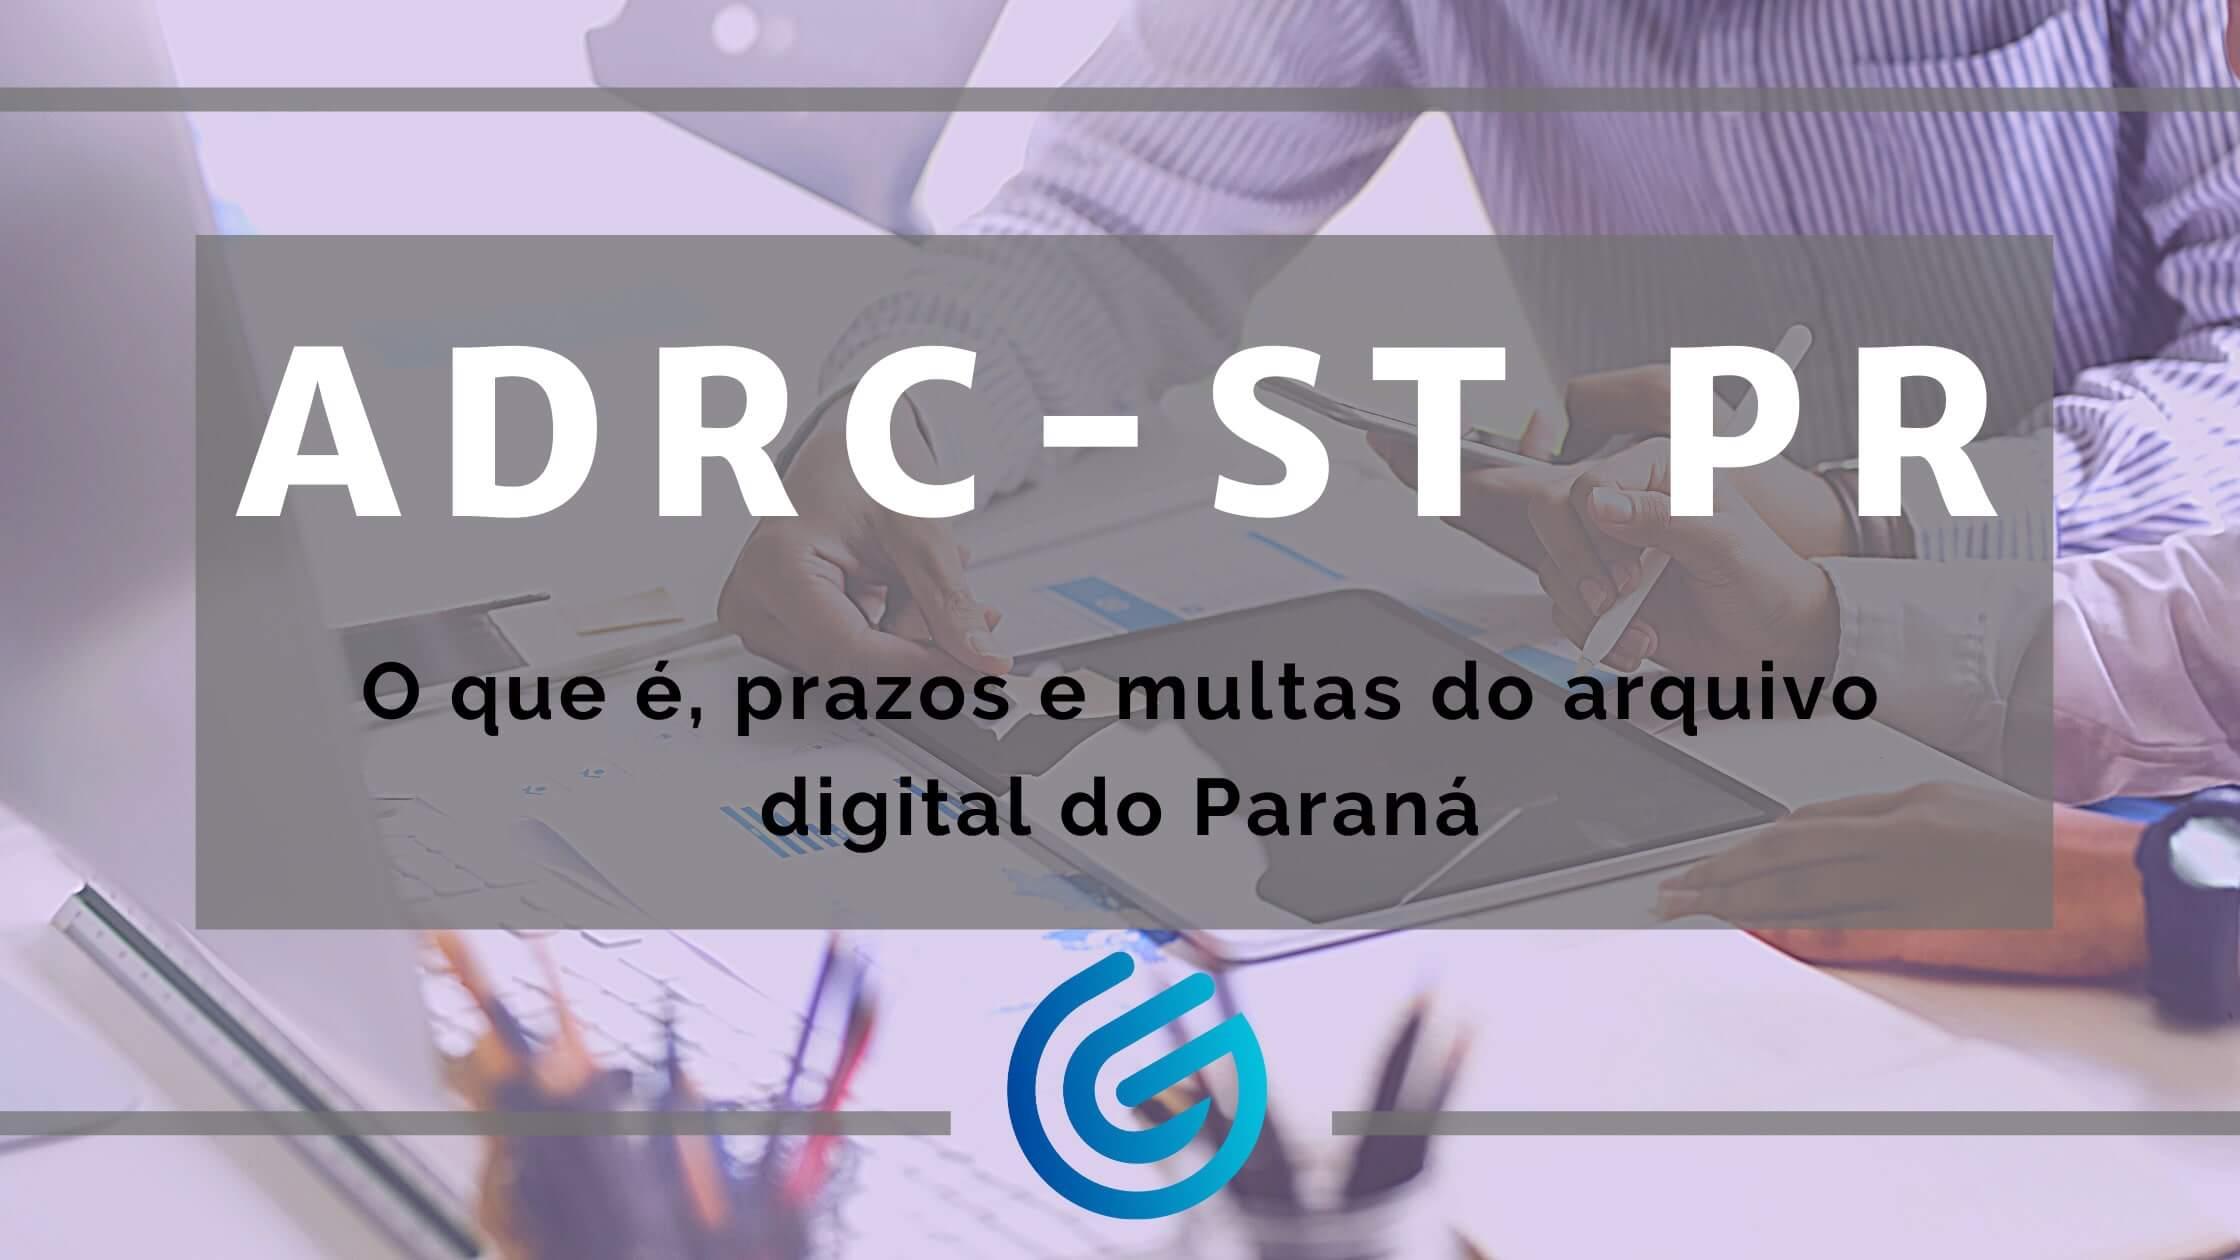 ADRC-ST-PR